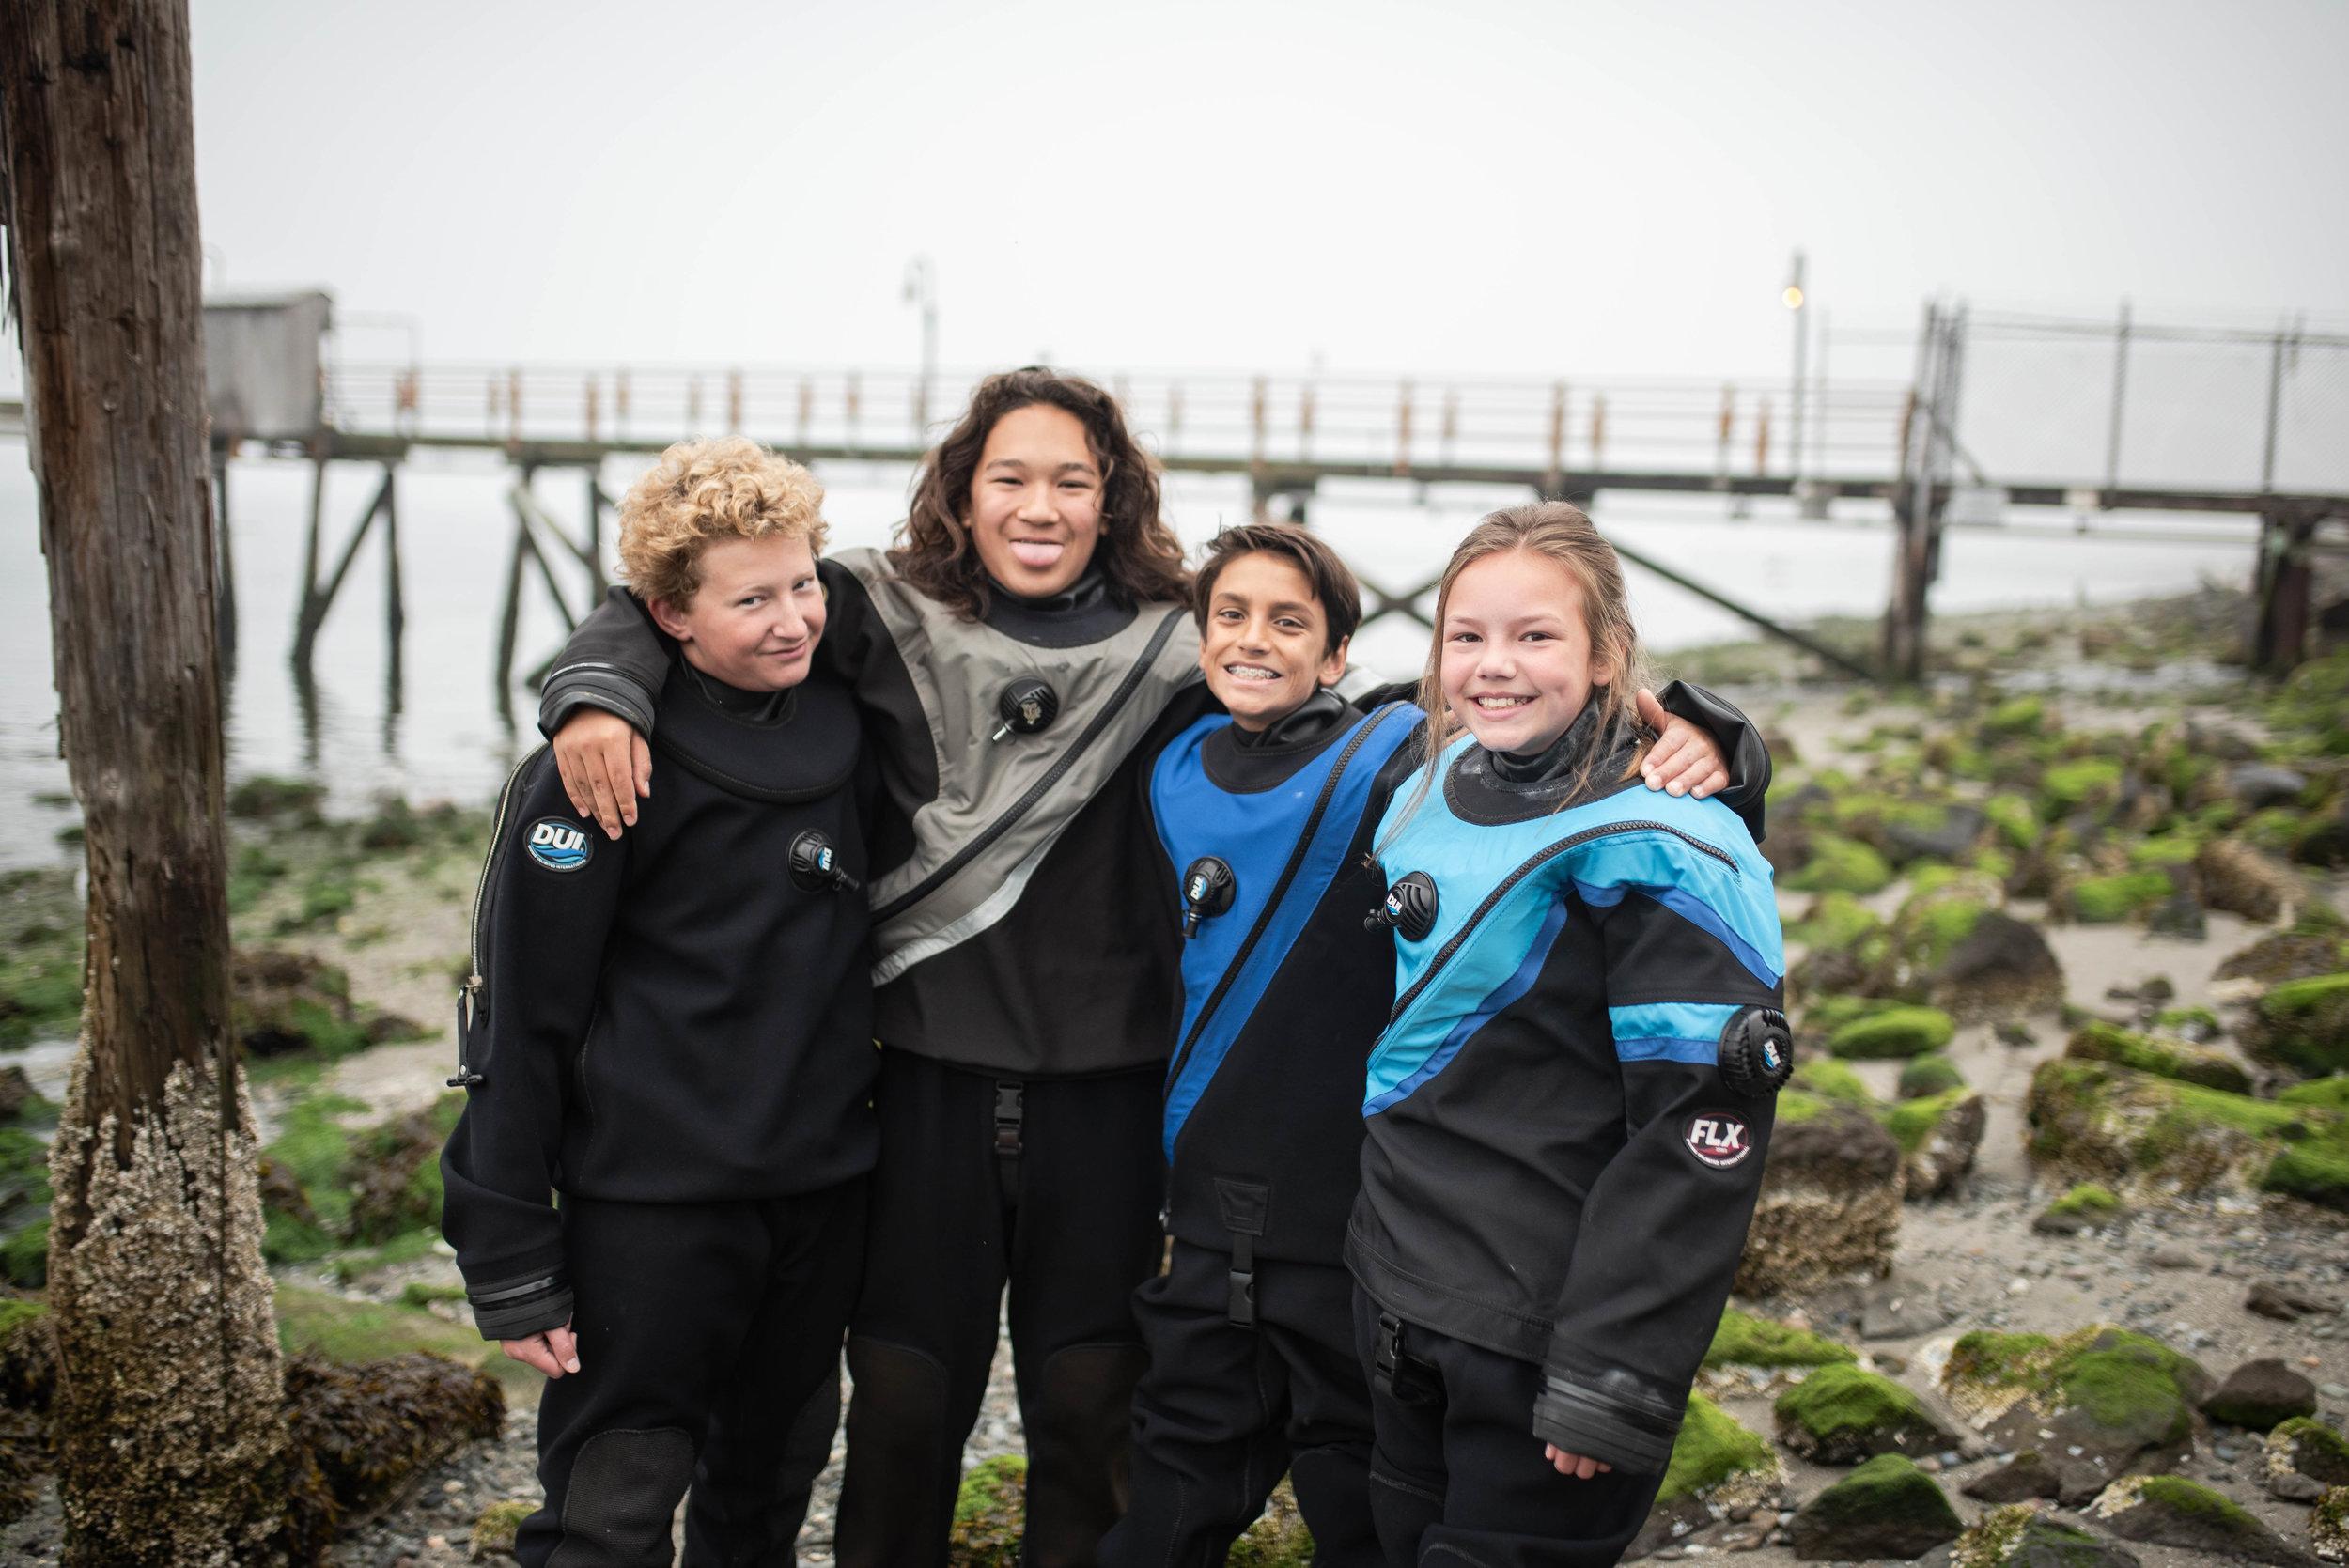 15 Annie Crawley Scuba Dive Team scubakids-217.jpg